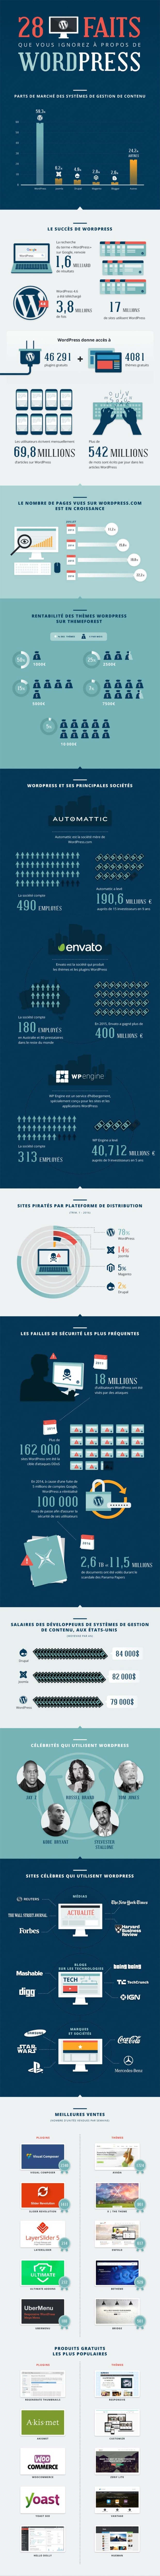 28 Faits sur WordPress